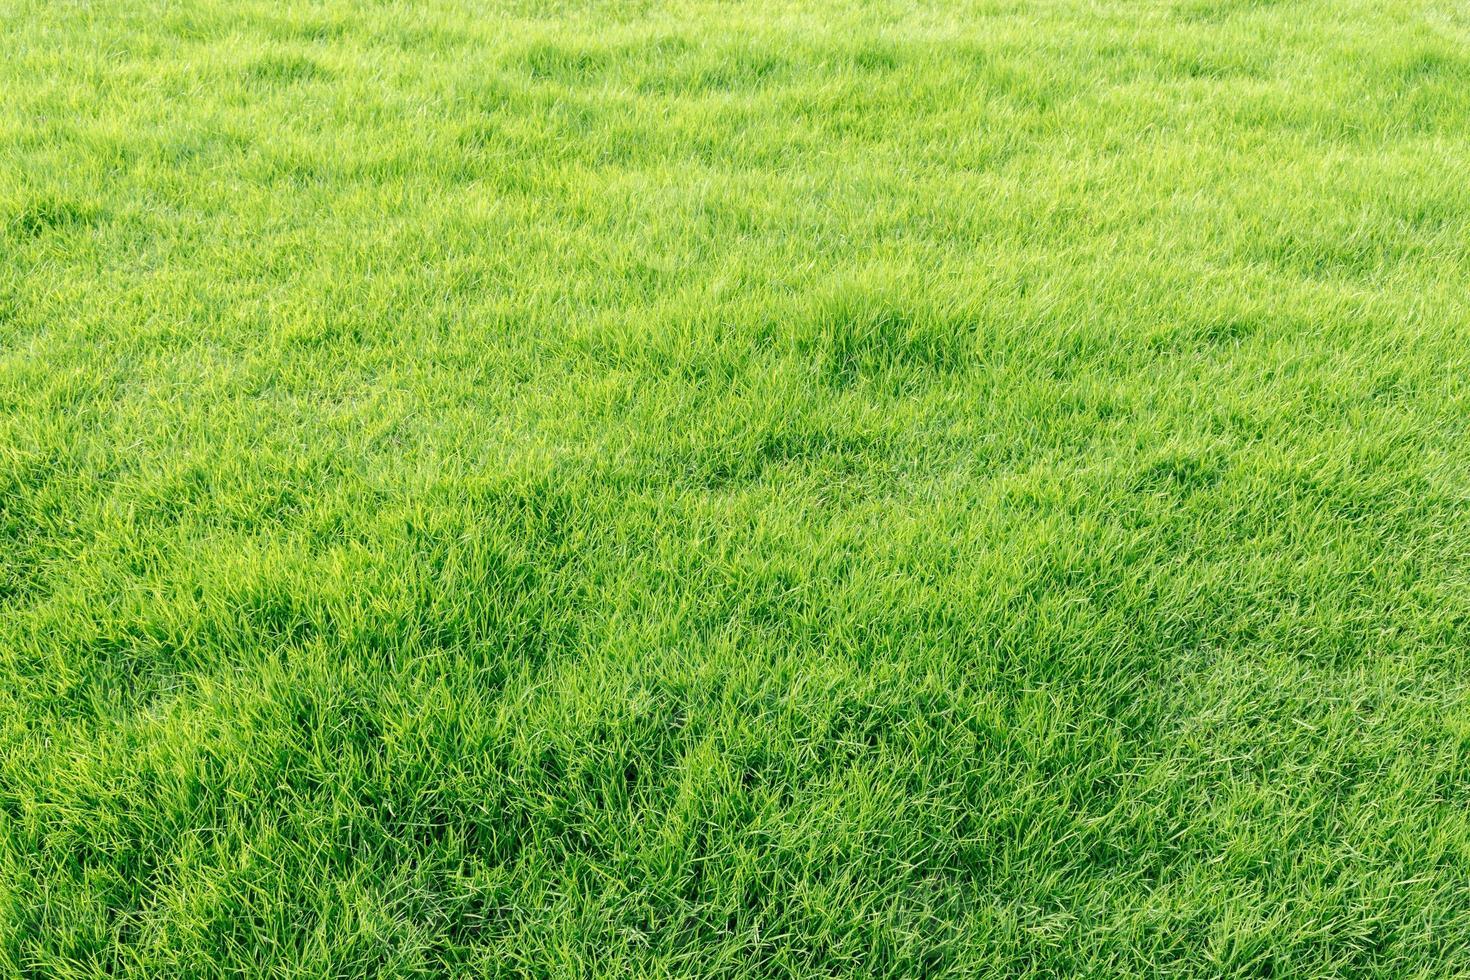 naturligt färskt grönt gräsfält foto